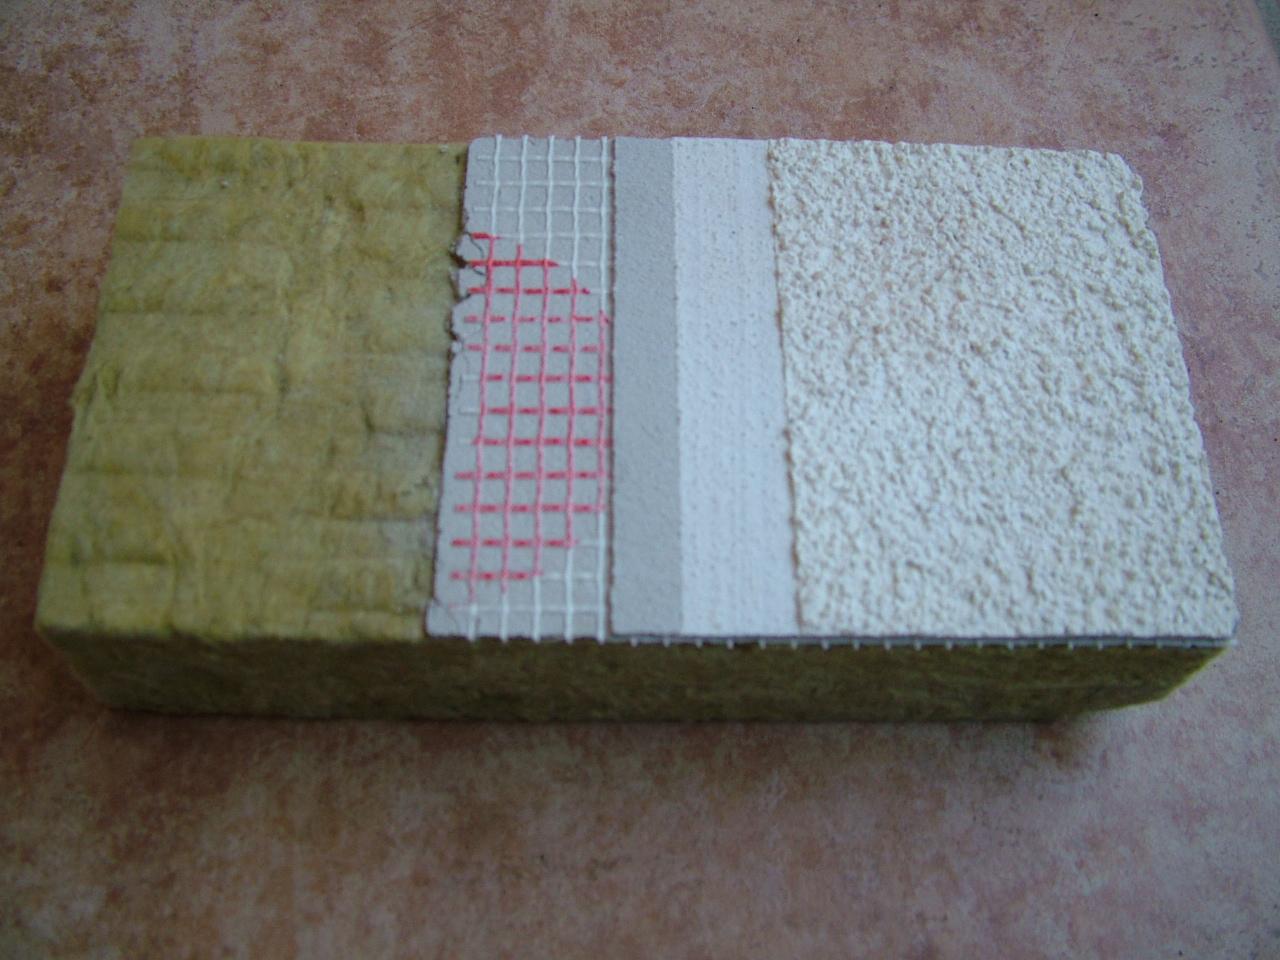 Aislamiento ecoinnovar placas solares murcia y alicante for Aislamiento lana de roca